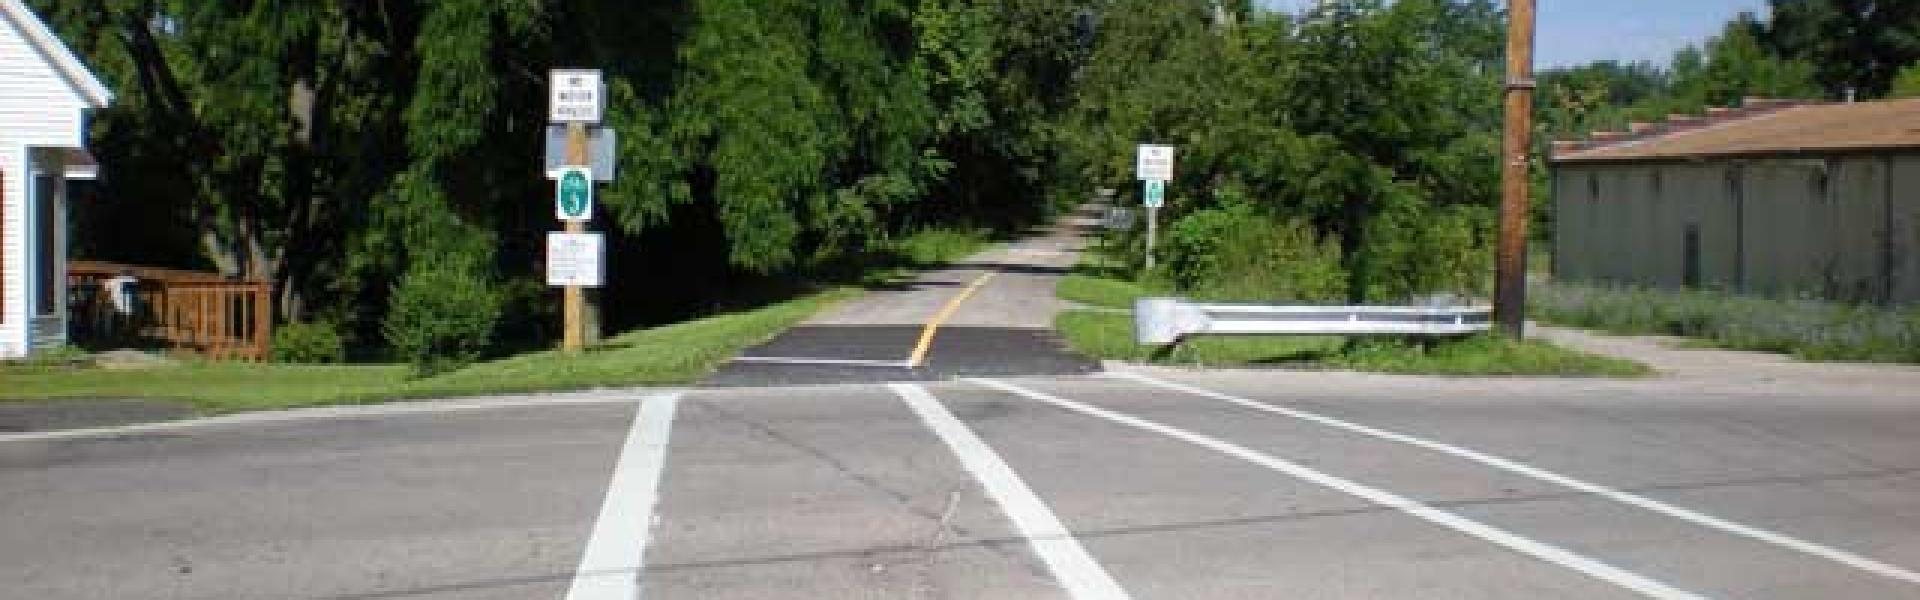 Xenia - Jamestown Connector   Miami Valley Bike Trails